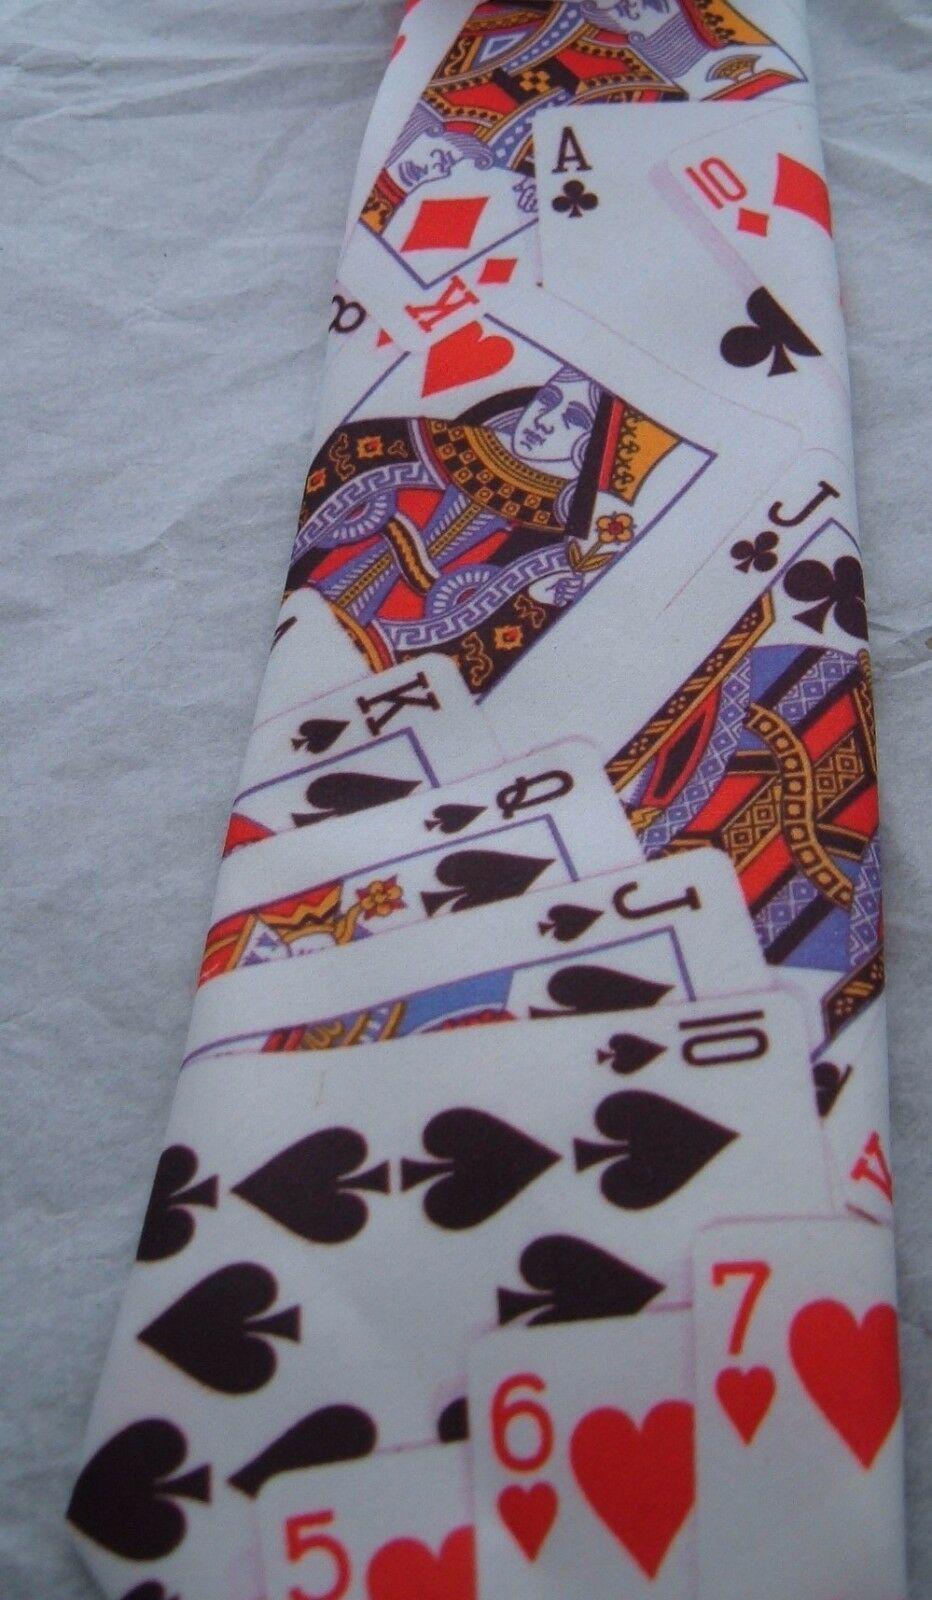 "Ralph Marlin Poker Cards Mens Neck Tie 56"" Gambler Vintage 1991 polyester image 2"